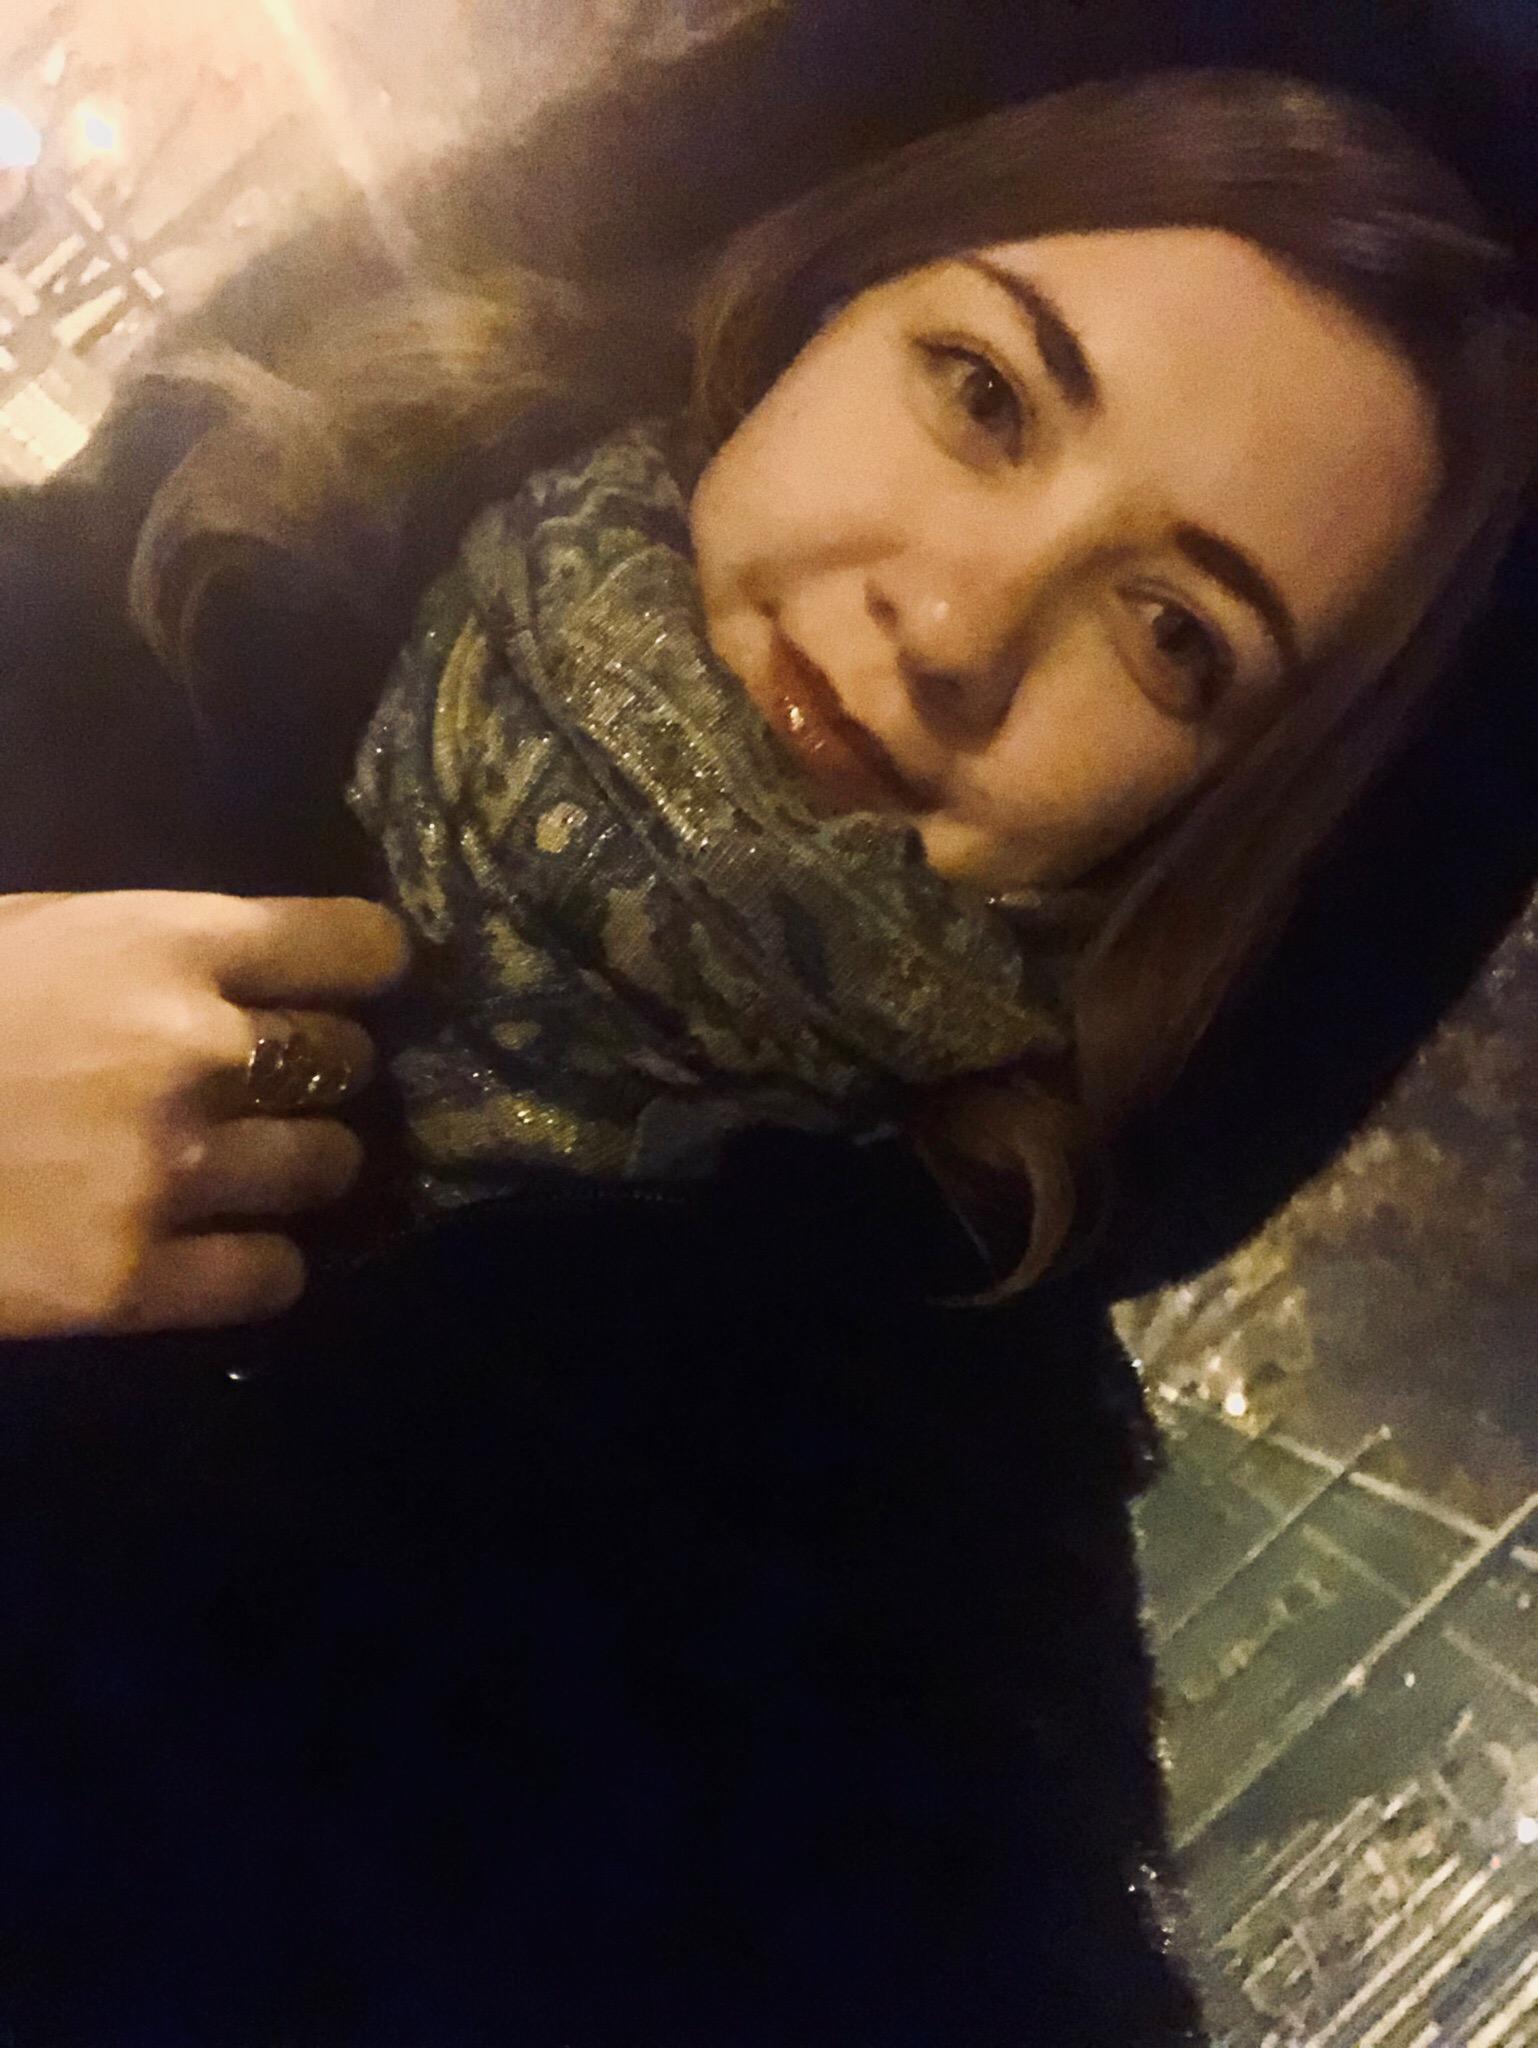 Selfie Anna Grigorenko nudes (72 photo), Ass, Is a cute, Boobs, legs 2020